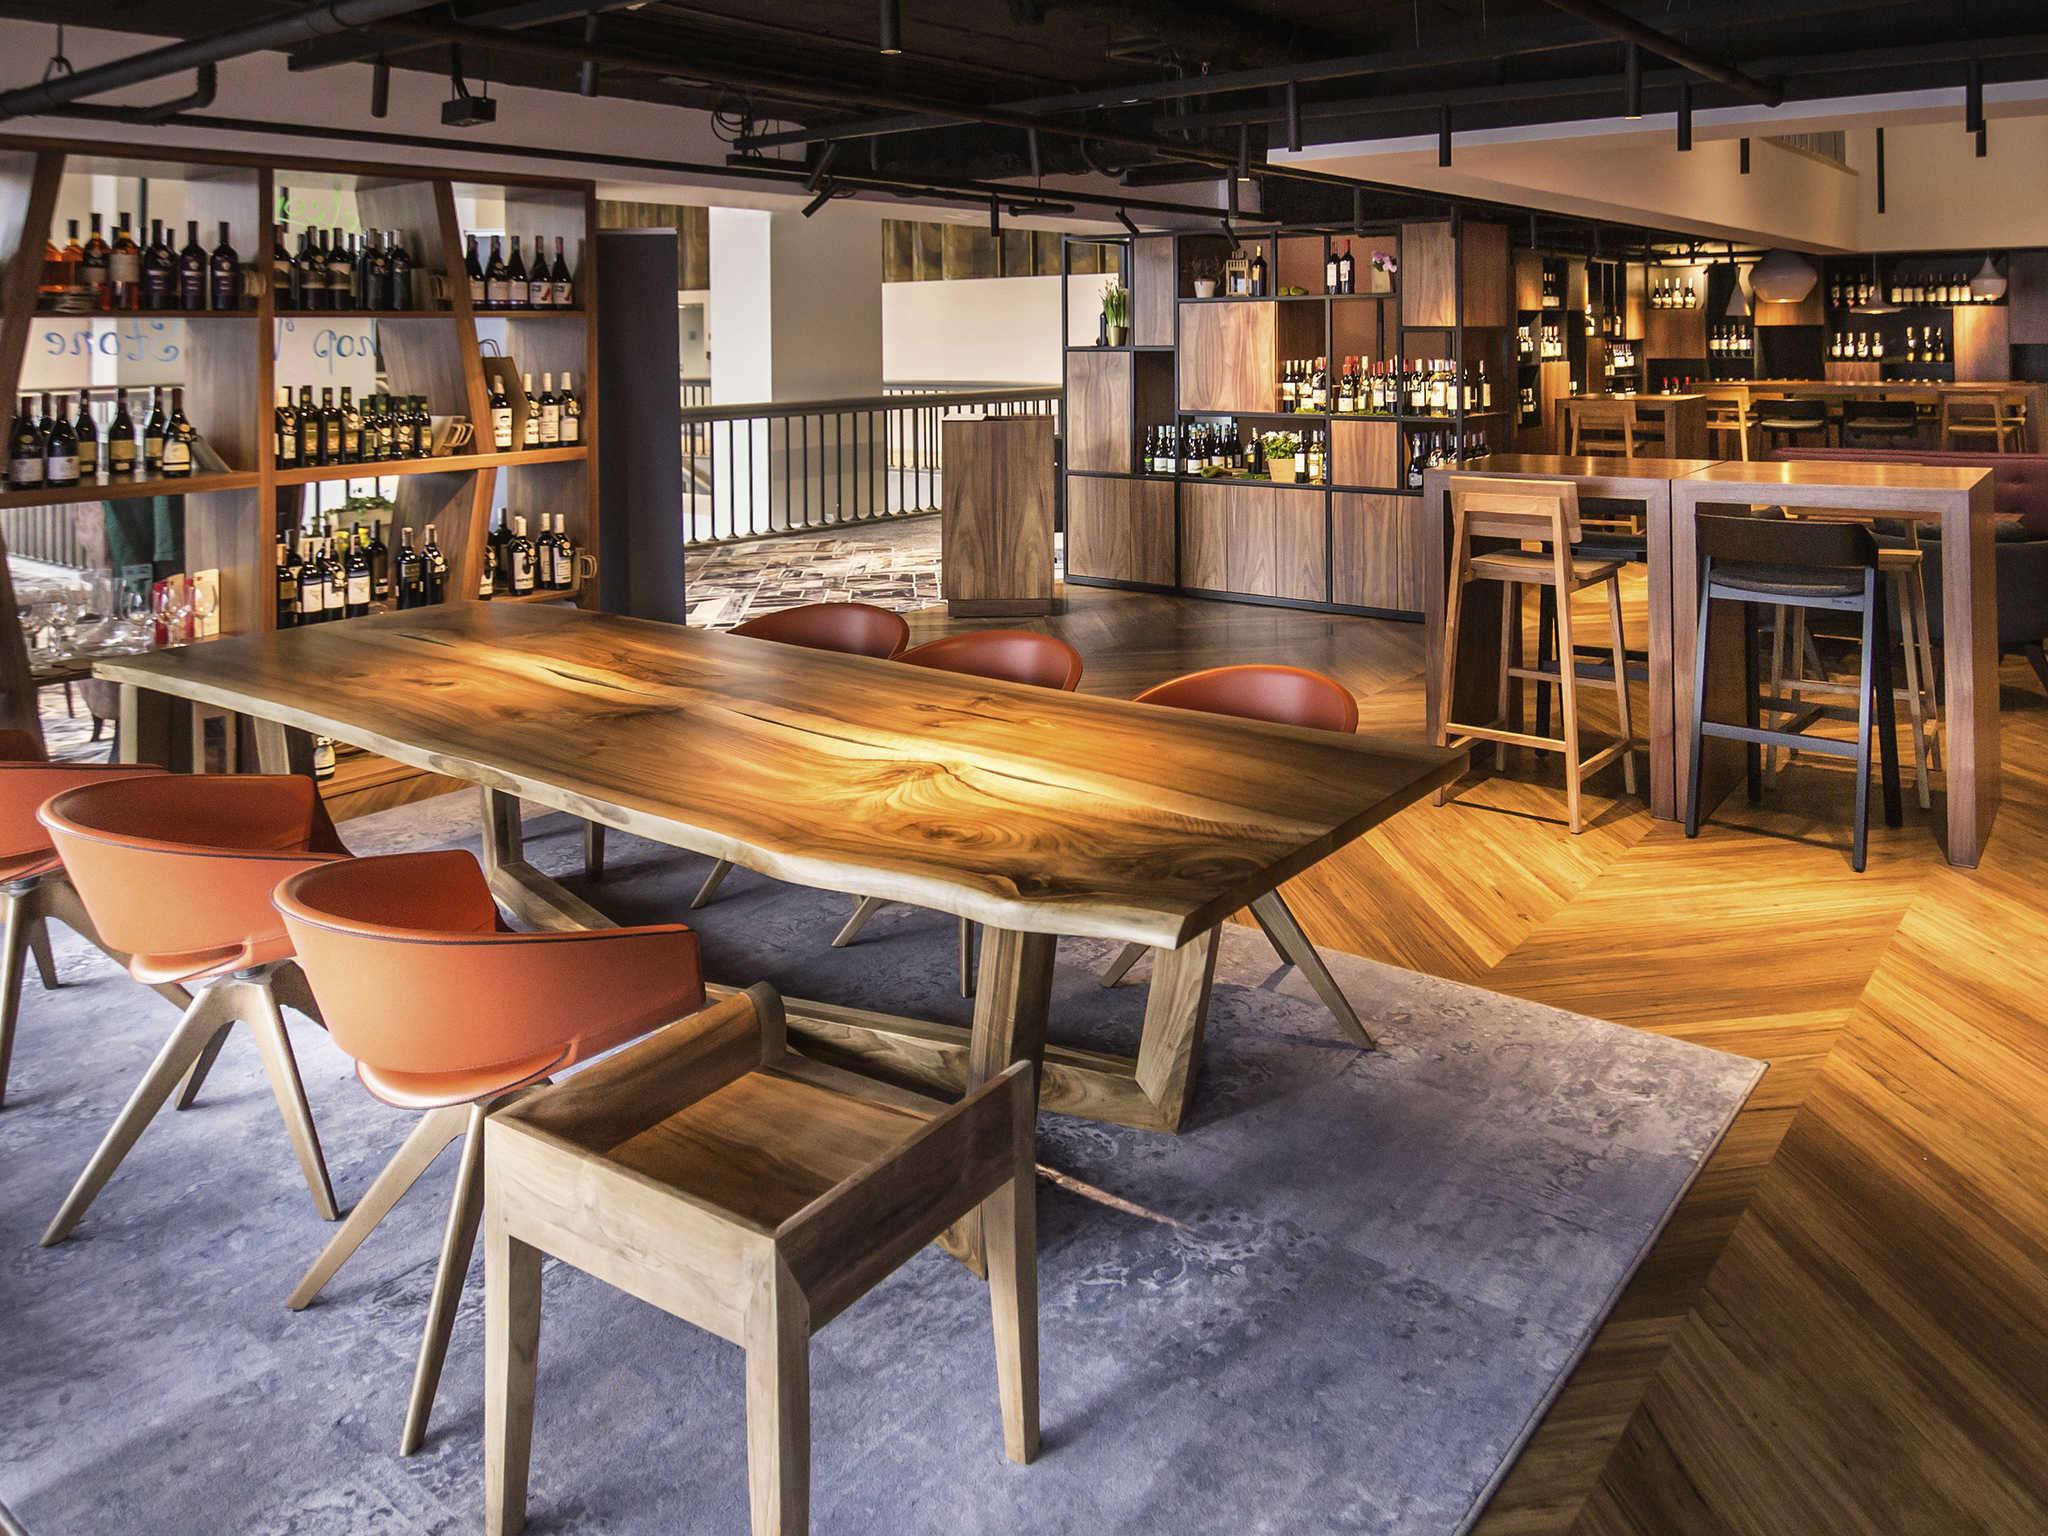 hardwood floor installation cost chicago of hotel novotel poznan centrum in restaurant novotel poznan centrum